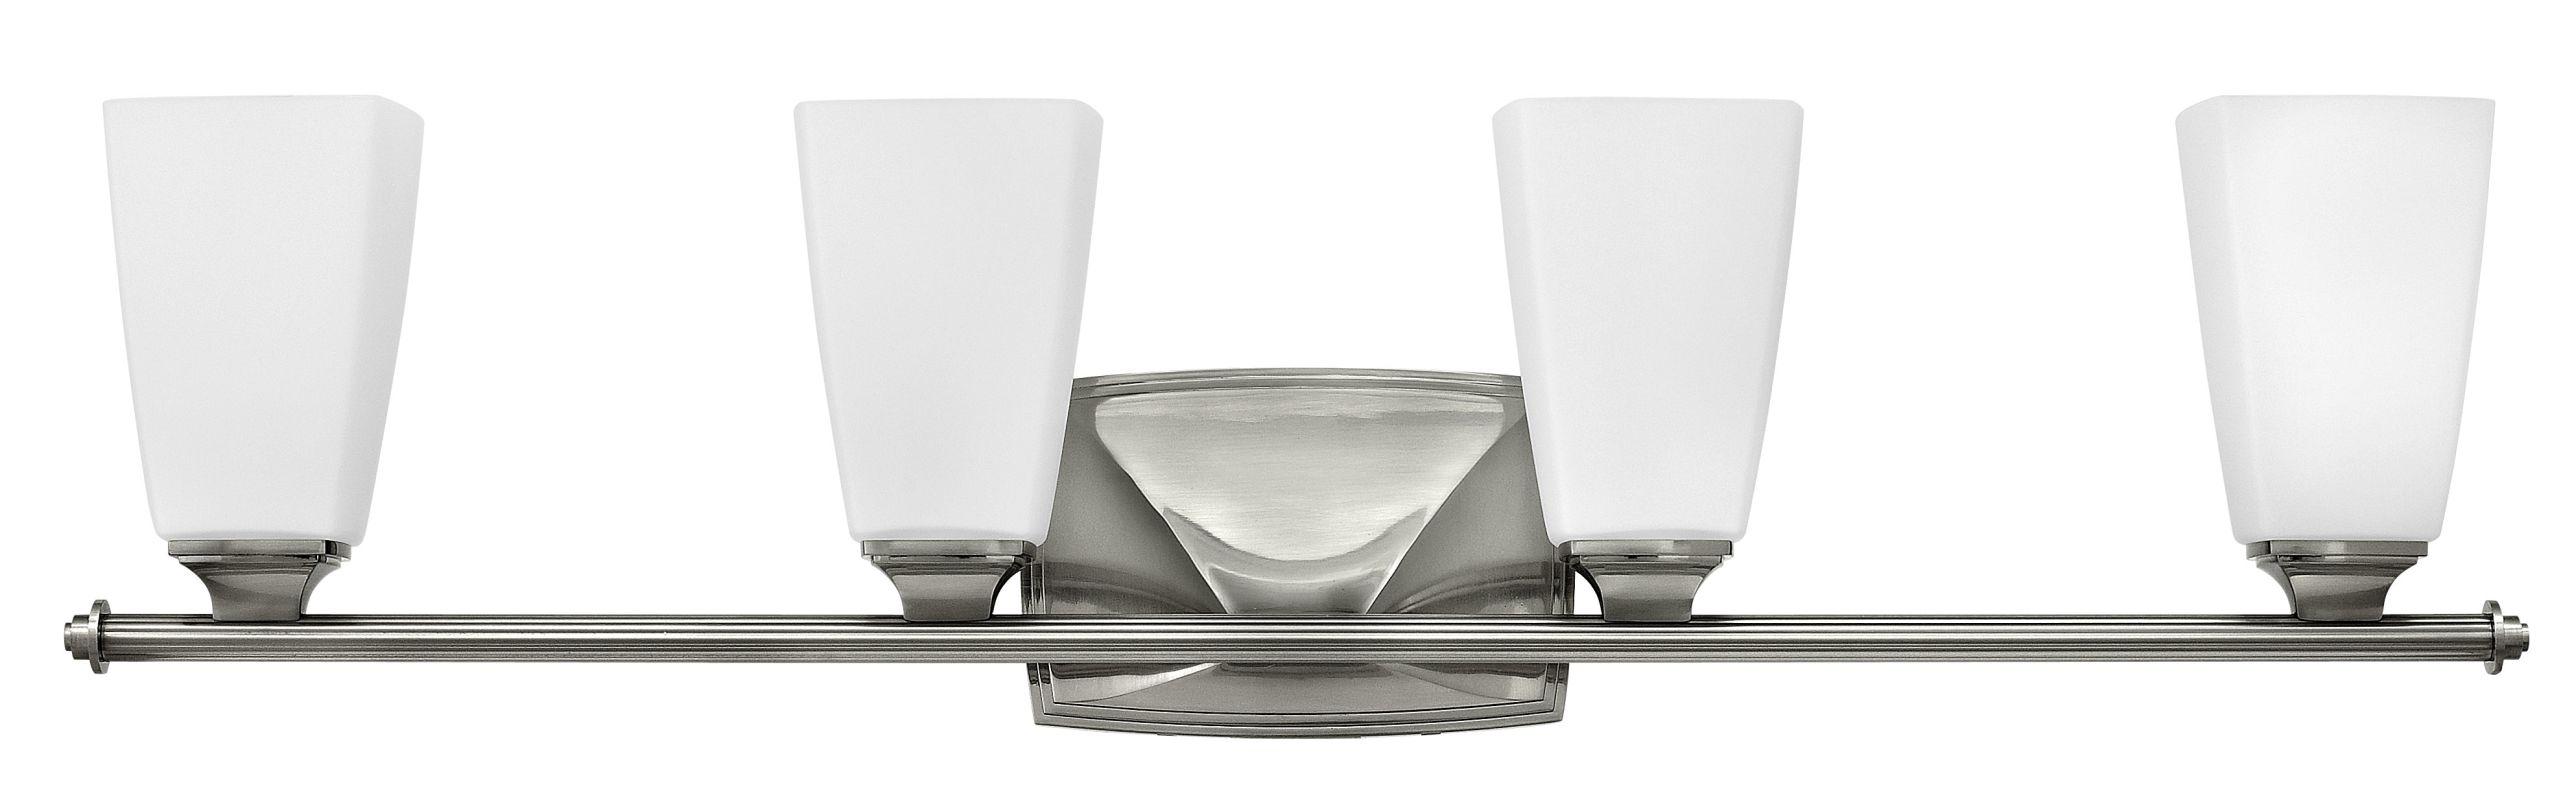 Hinkley Lighting 53014 4 Light Bathroom Vanity Light with Frosted